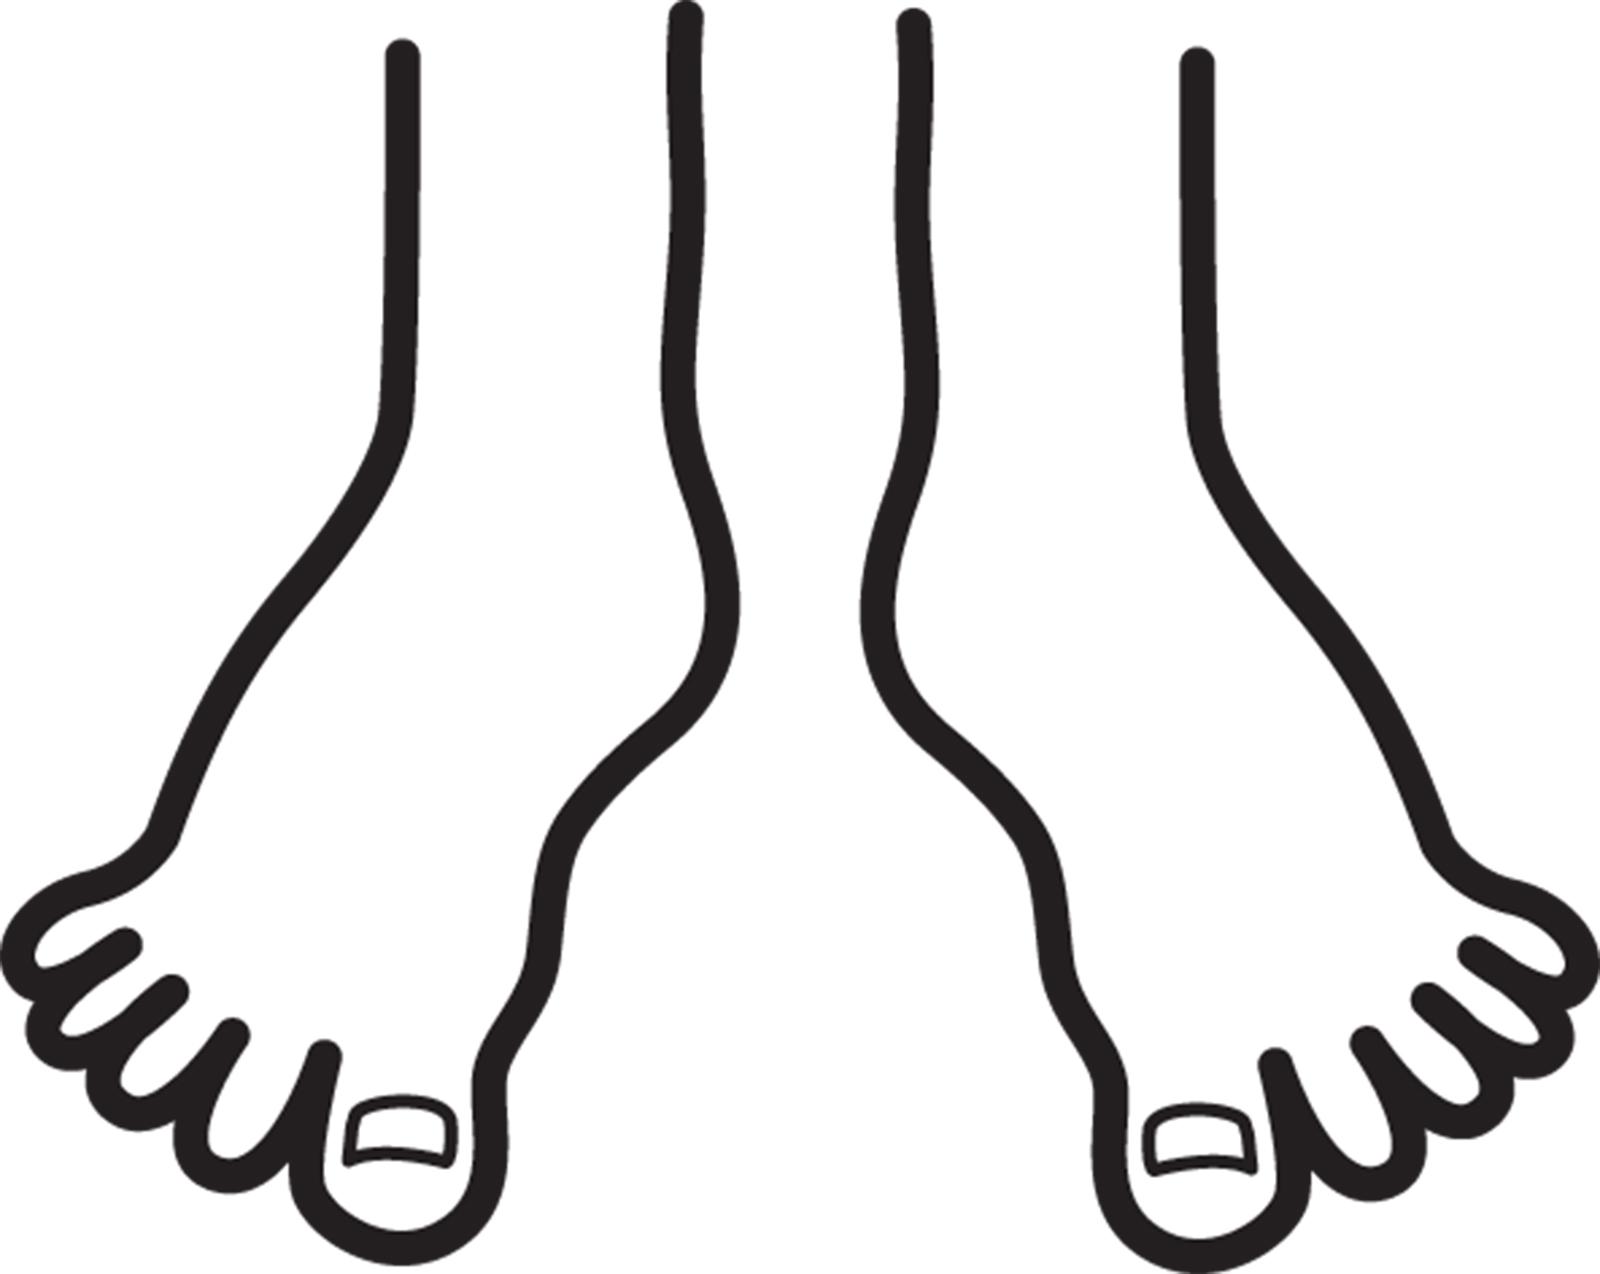 Feet-Feet-18